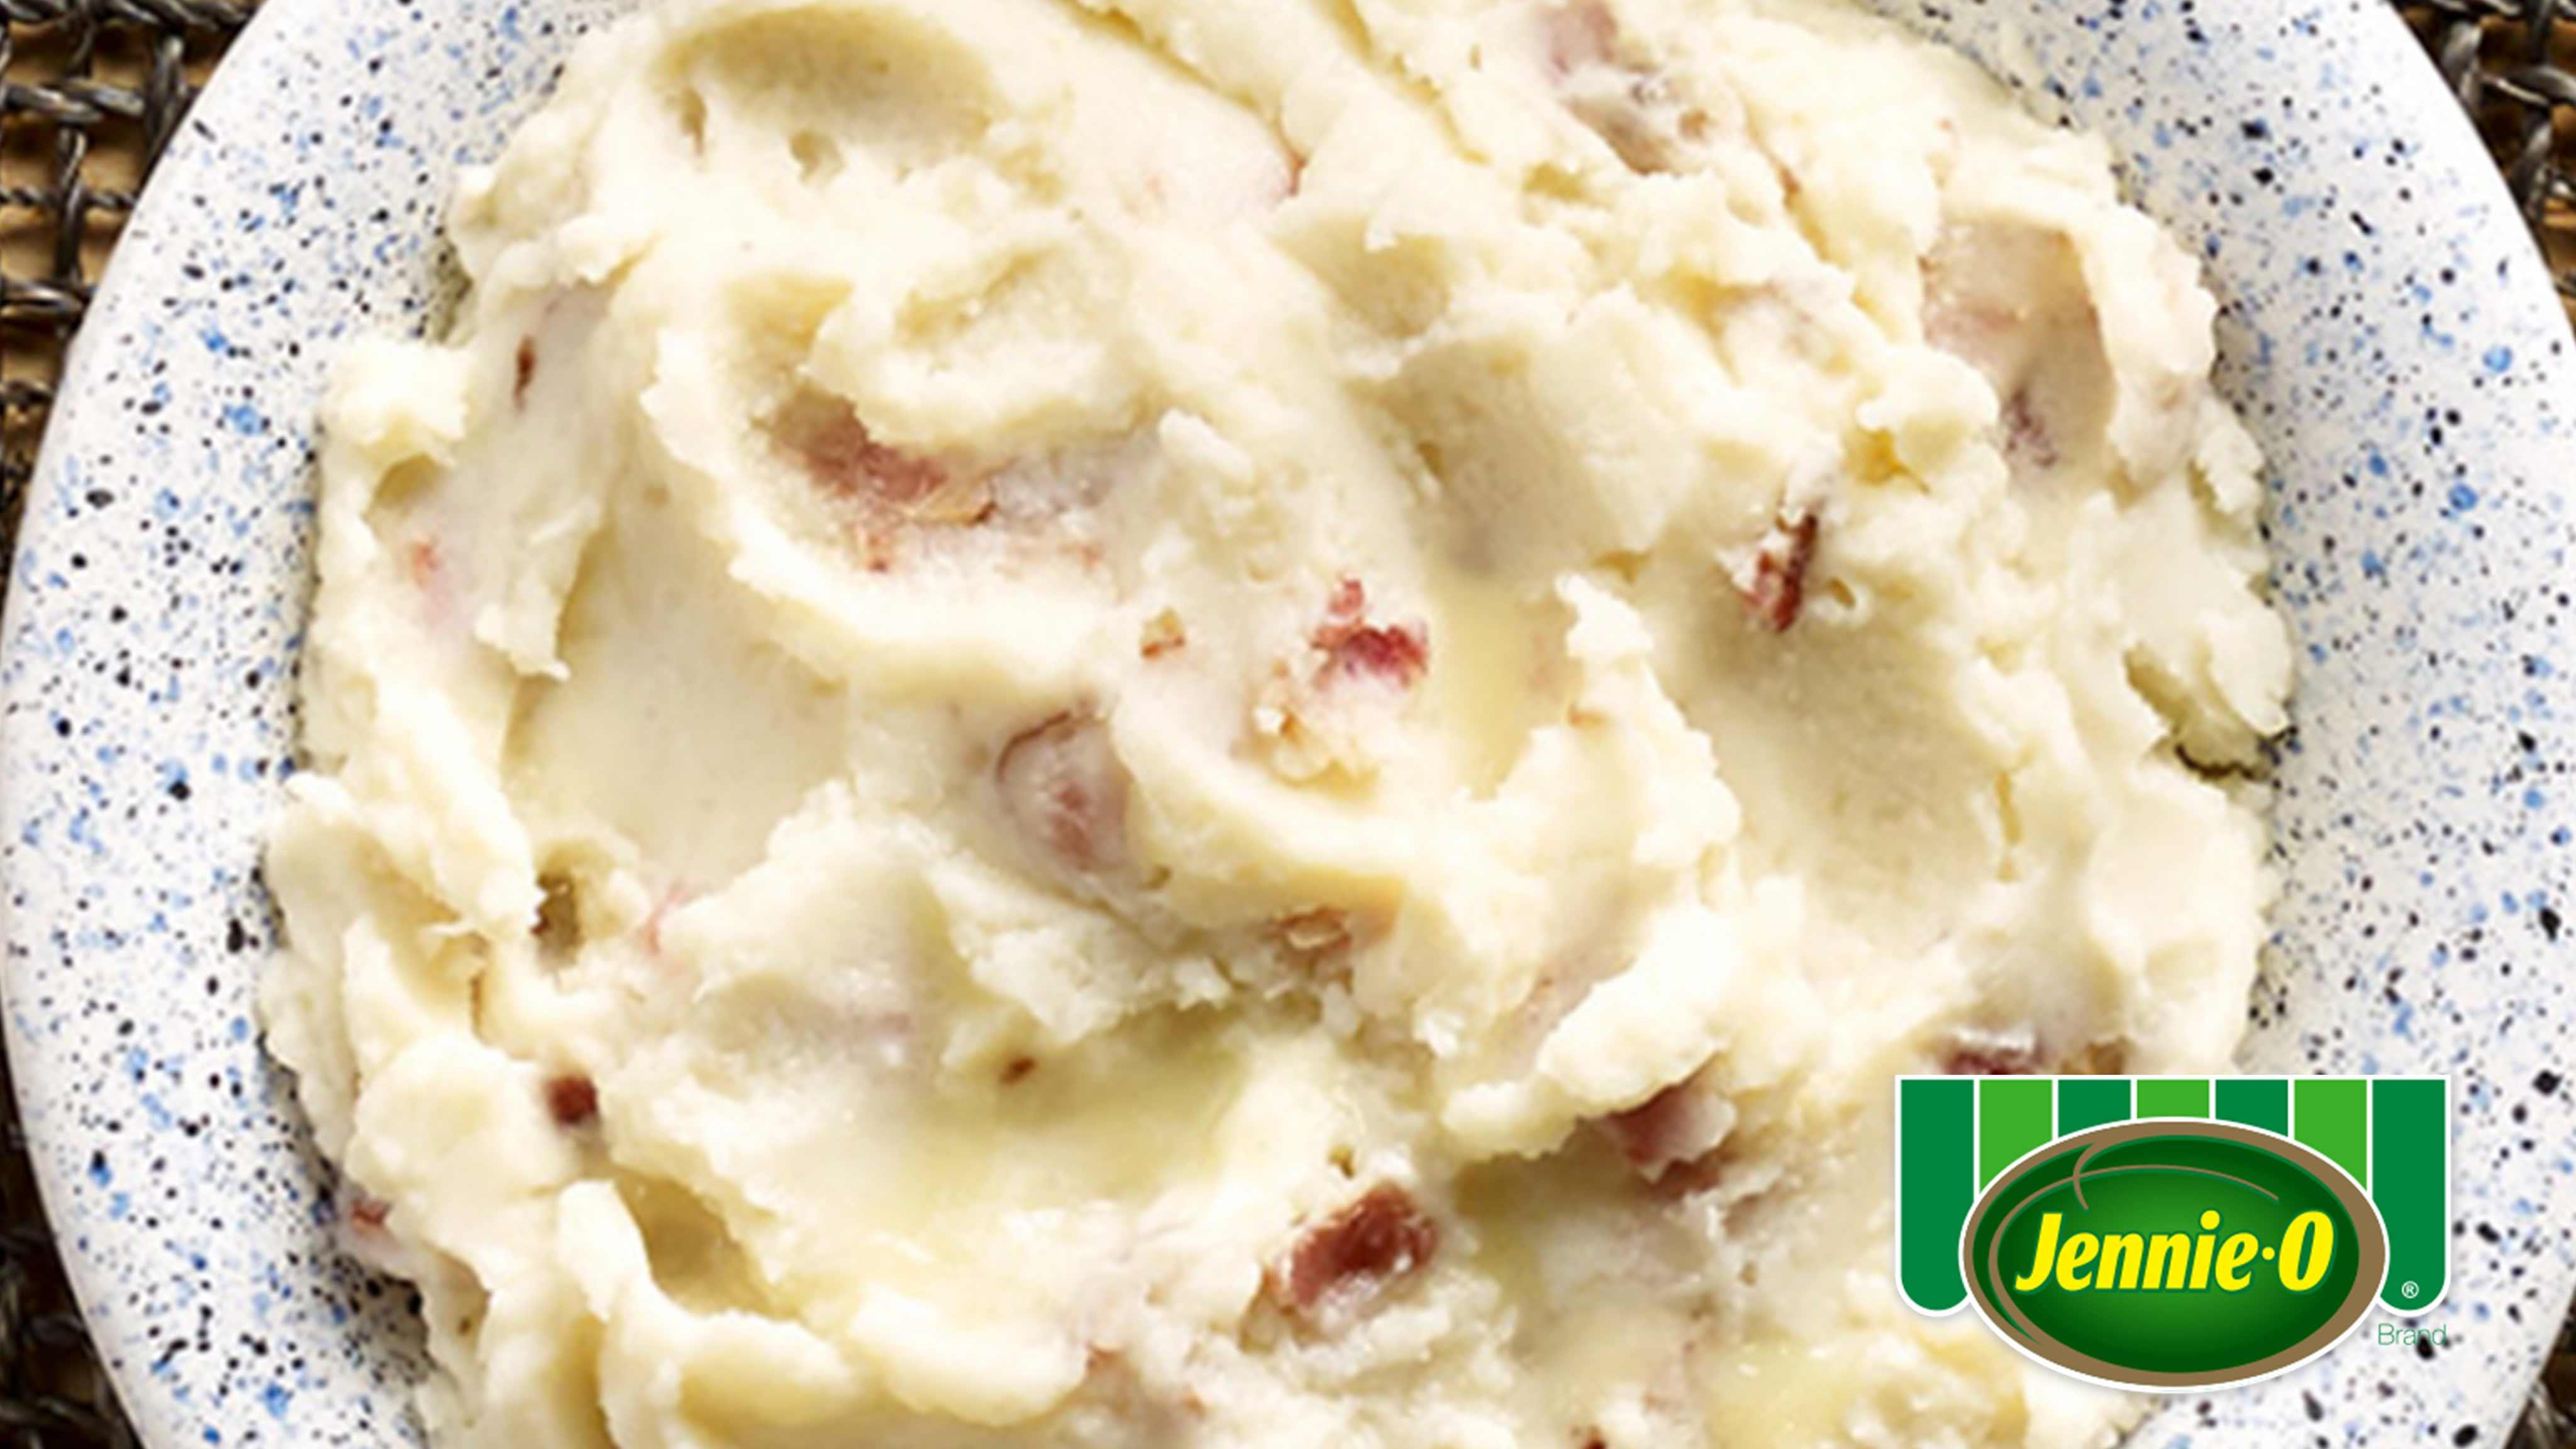 Image for Recipe Garlic and Rosemary Mashed Potatoes